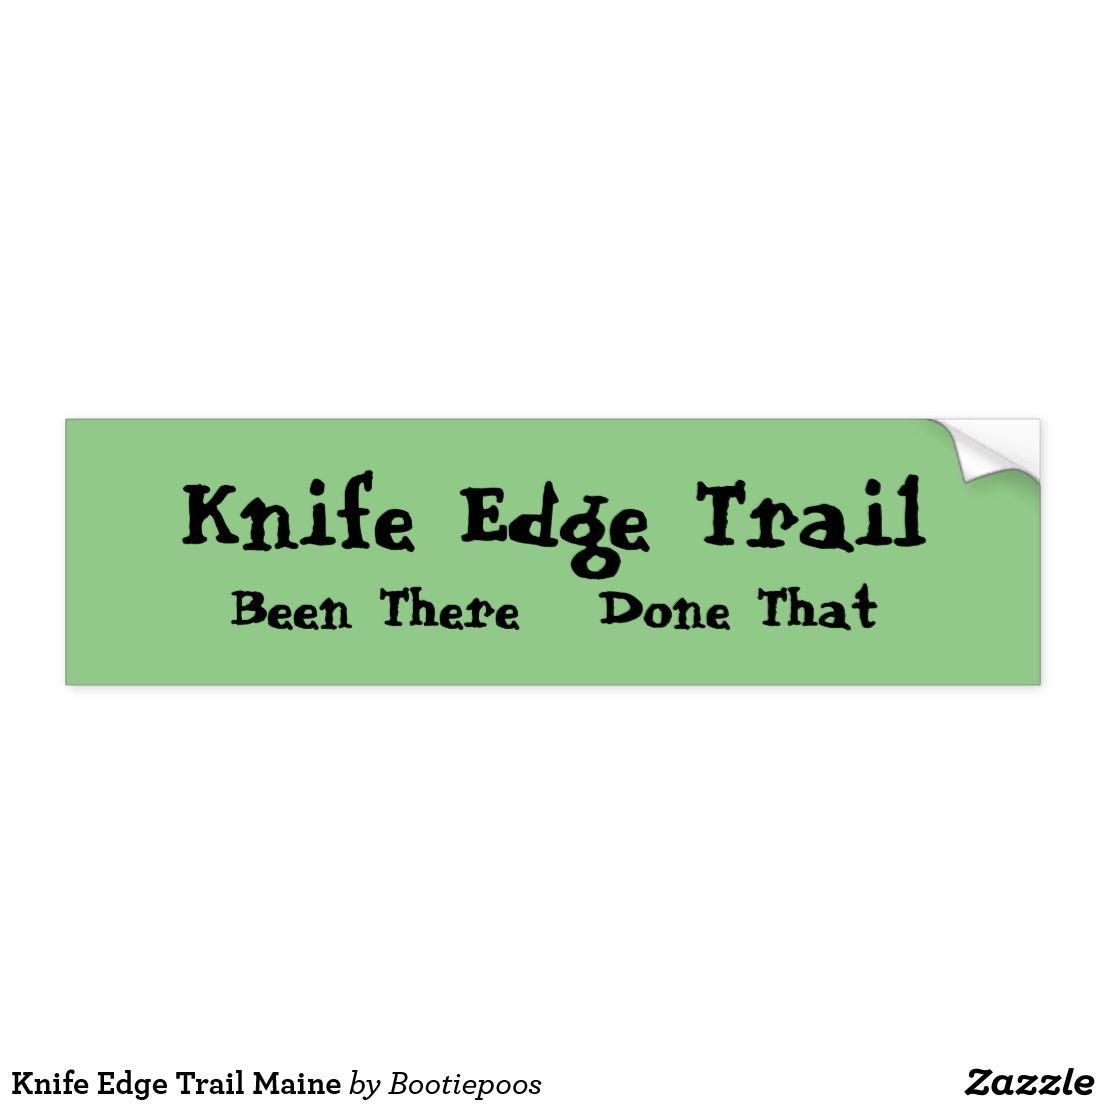 Knife Edge Trail Maine Bumper Sticker Zazzle Com Bumper Stickers Strong Adhesive Bumpers [ 1106 x 1106 Pixel ]